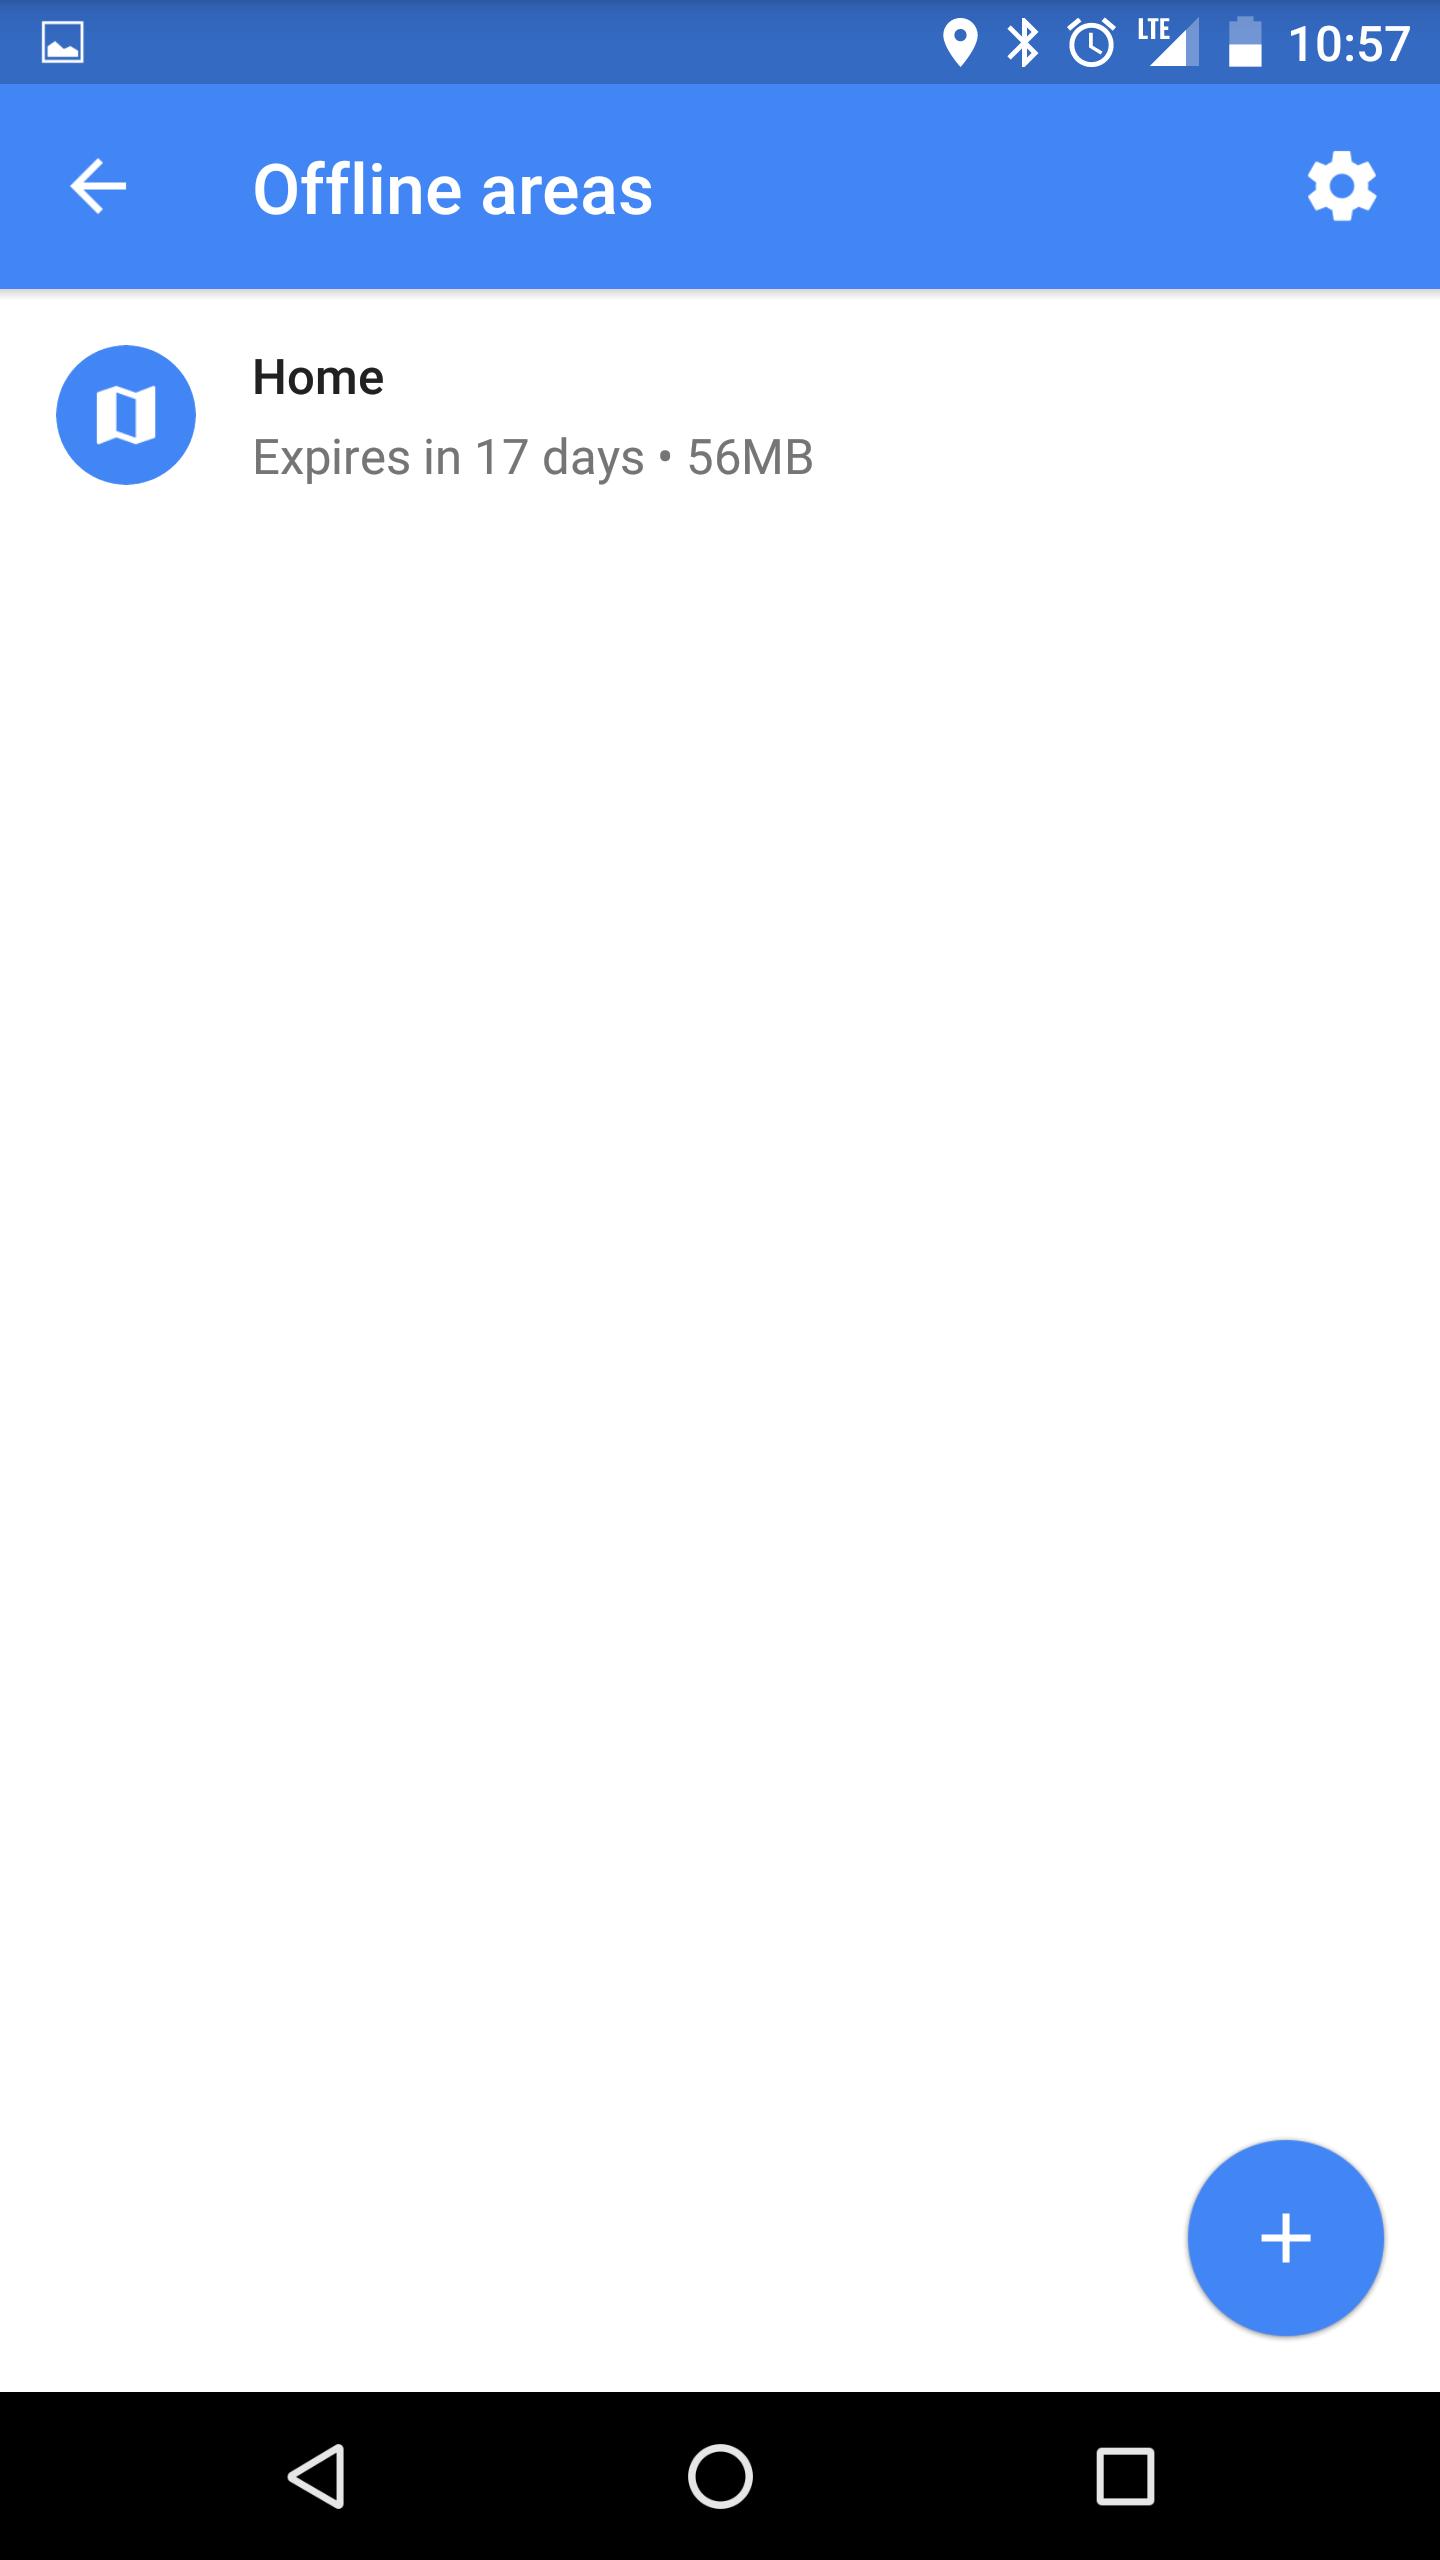 How to use Google Maps offline View Offline Google Maps on google maps error, google maps cuba, google maps web, google maps windows, google maps print, google maps mobile, google maps 2014, google maps desktop, google maps iphone, google maps 280, google maps de, google maps search, google maps home, google maps online, google maps lt, google maps hidden, google maps android, google maps lv, google maps advertising,